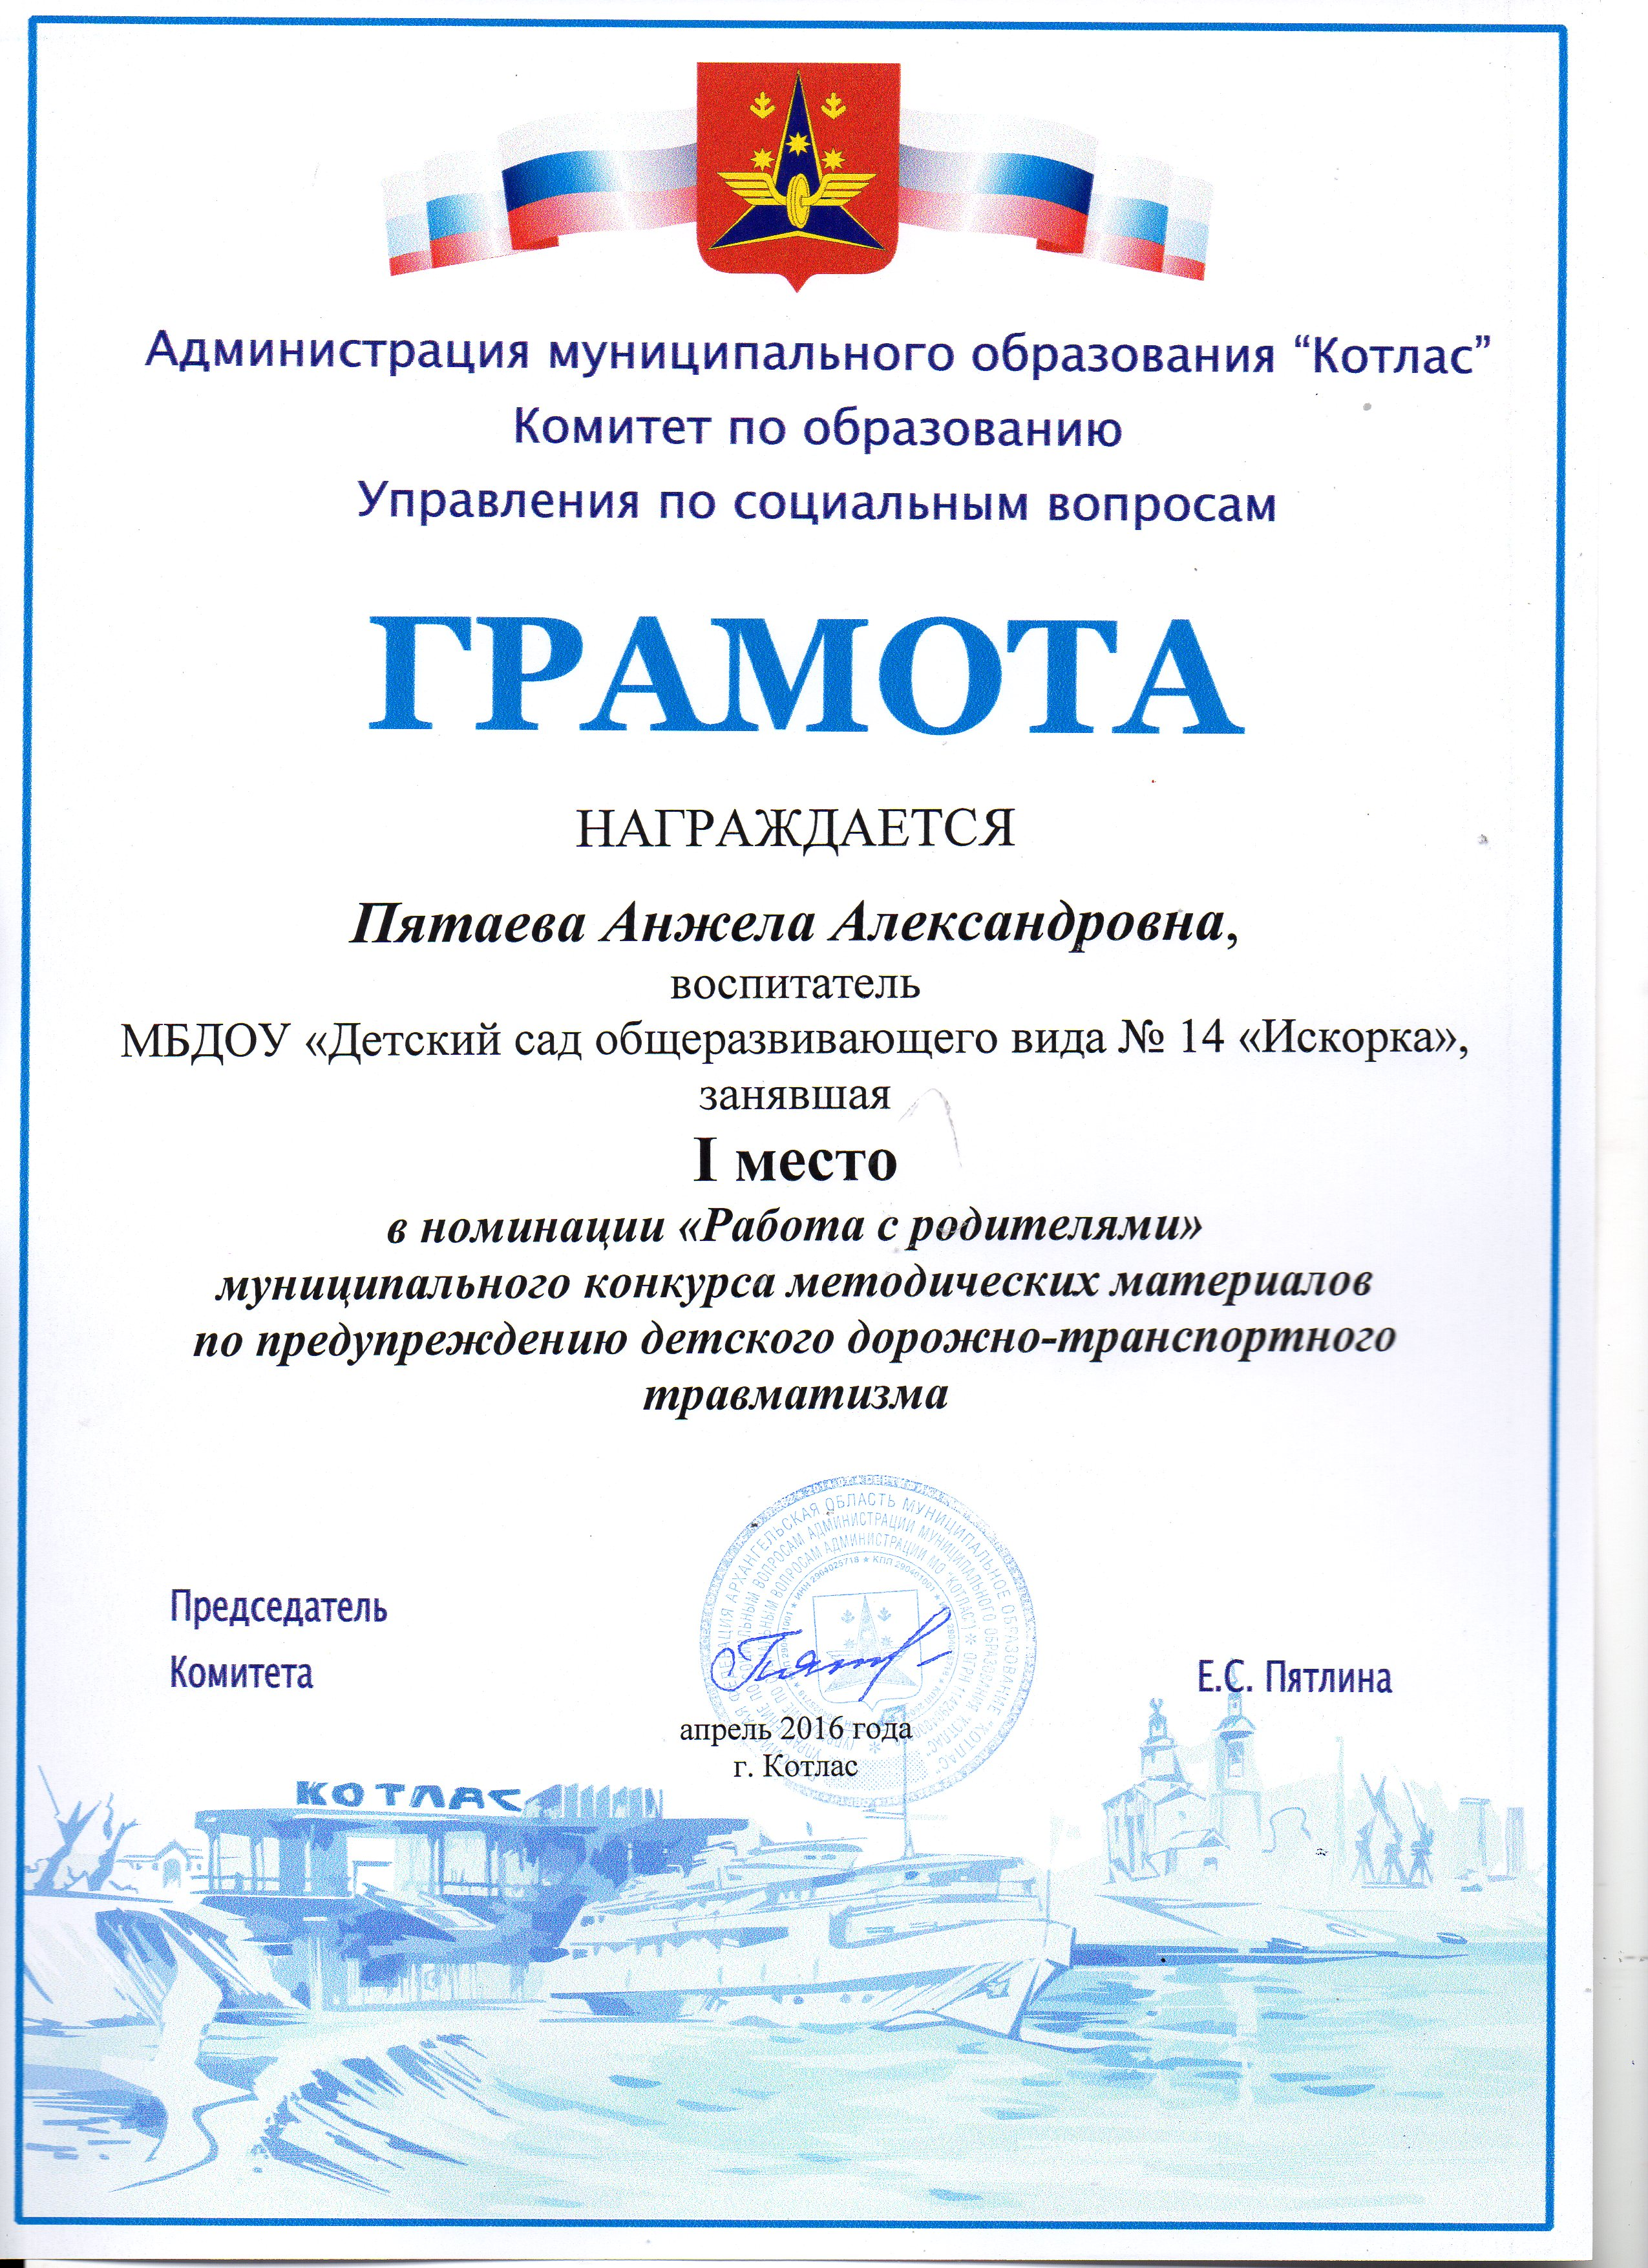 img901